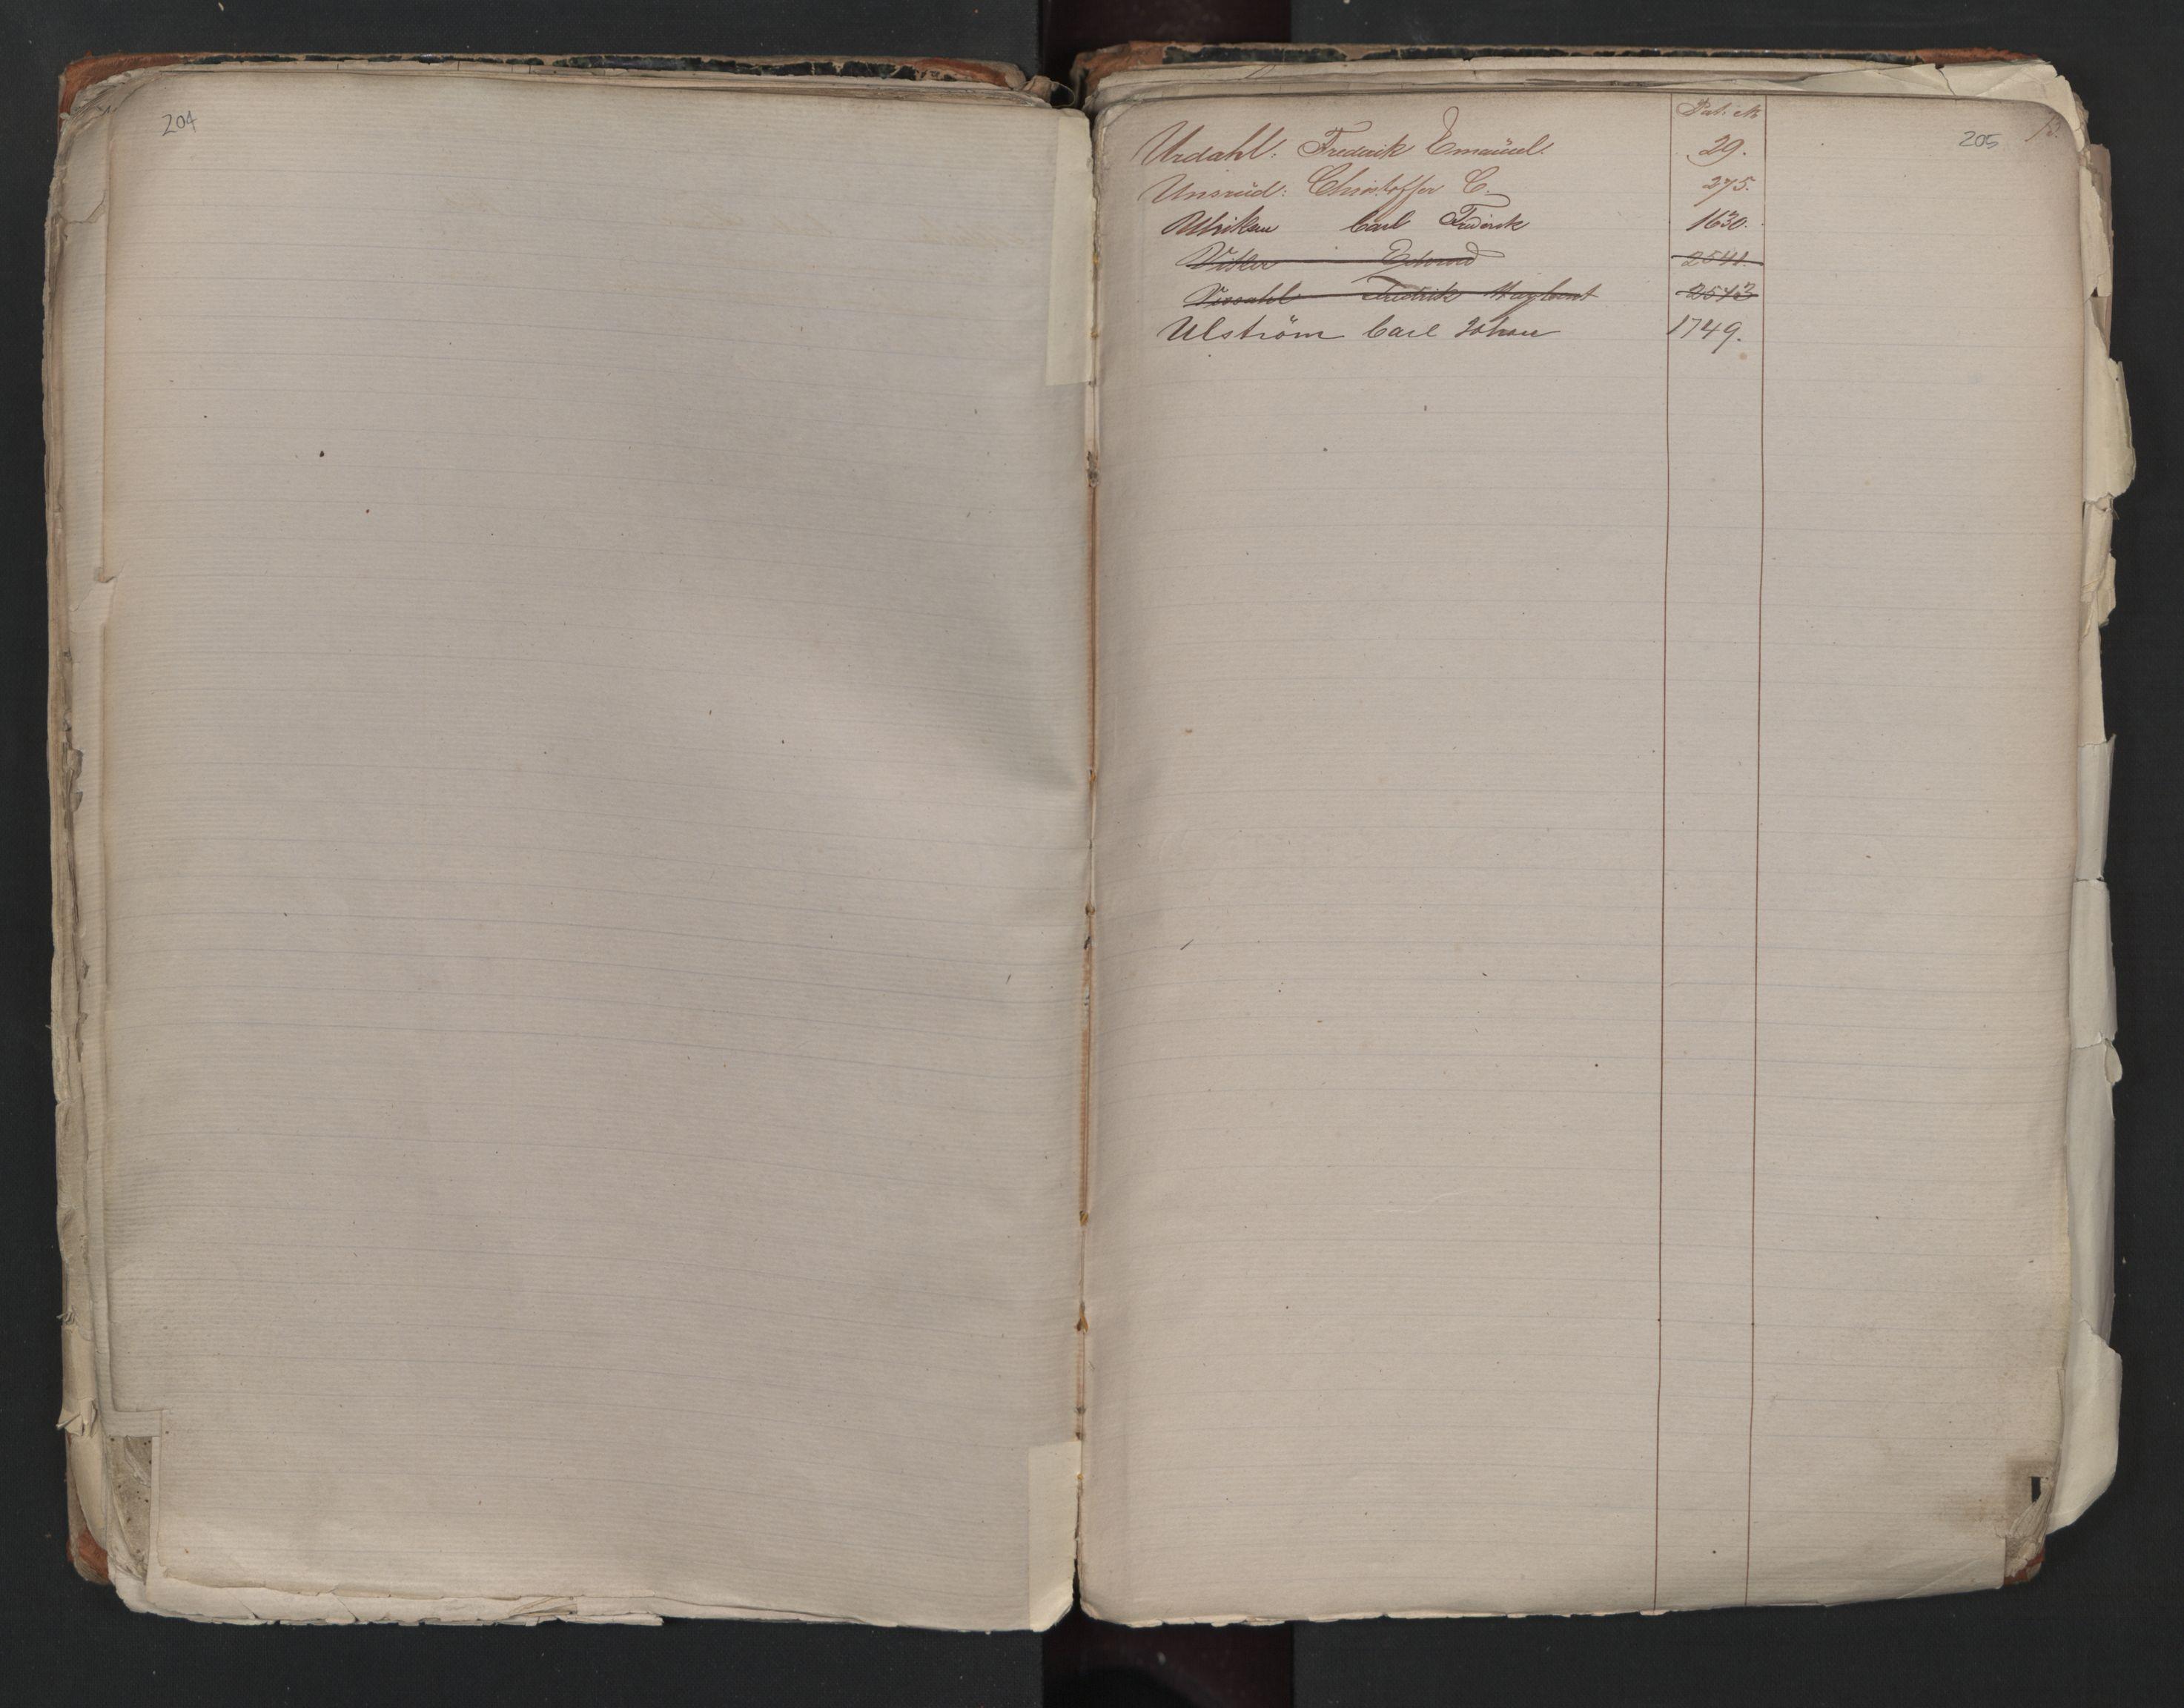 SAO, Oslo sjømannskontor, F/Fa/L0001: Register for Kristiania krets, 1866-1891, s. 204-205